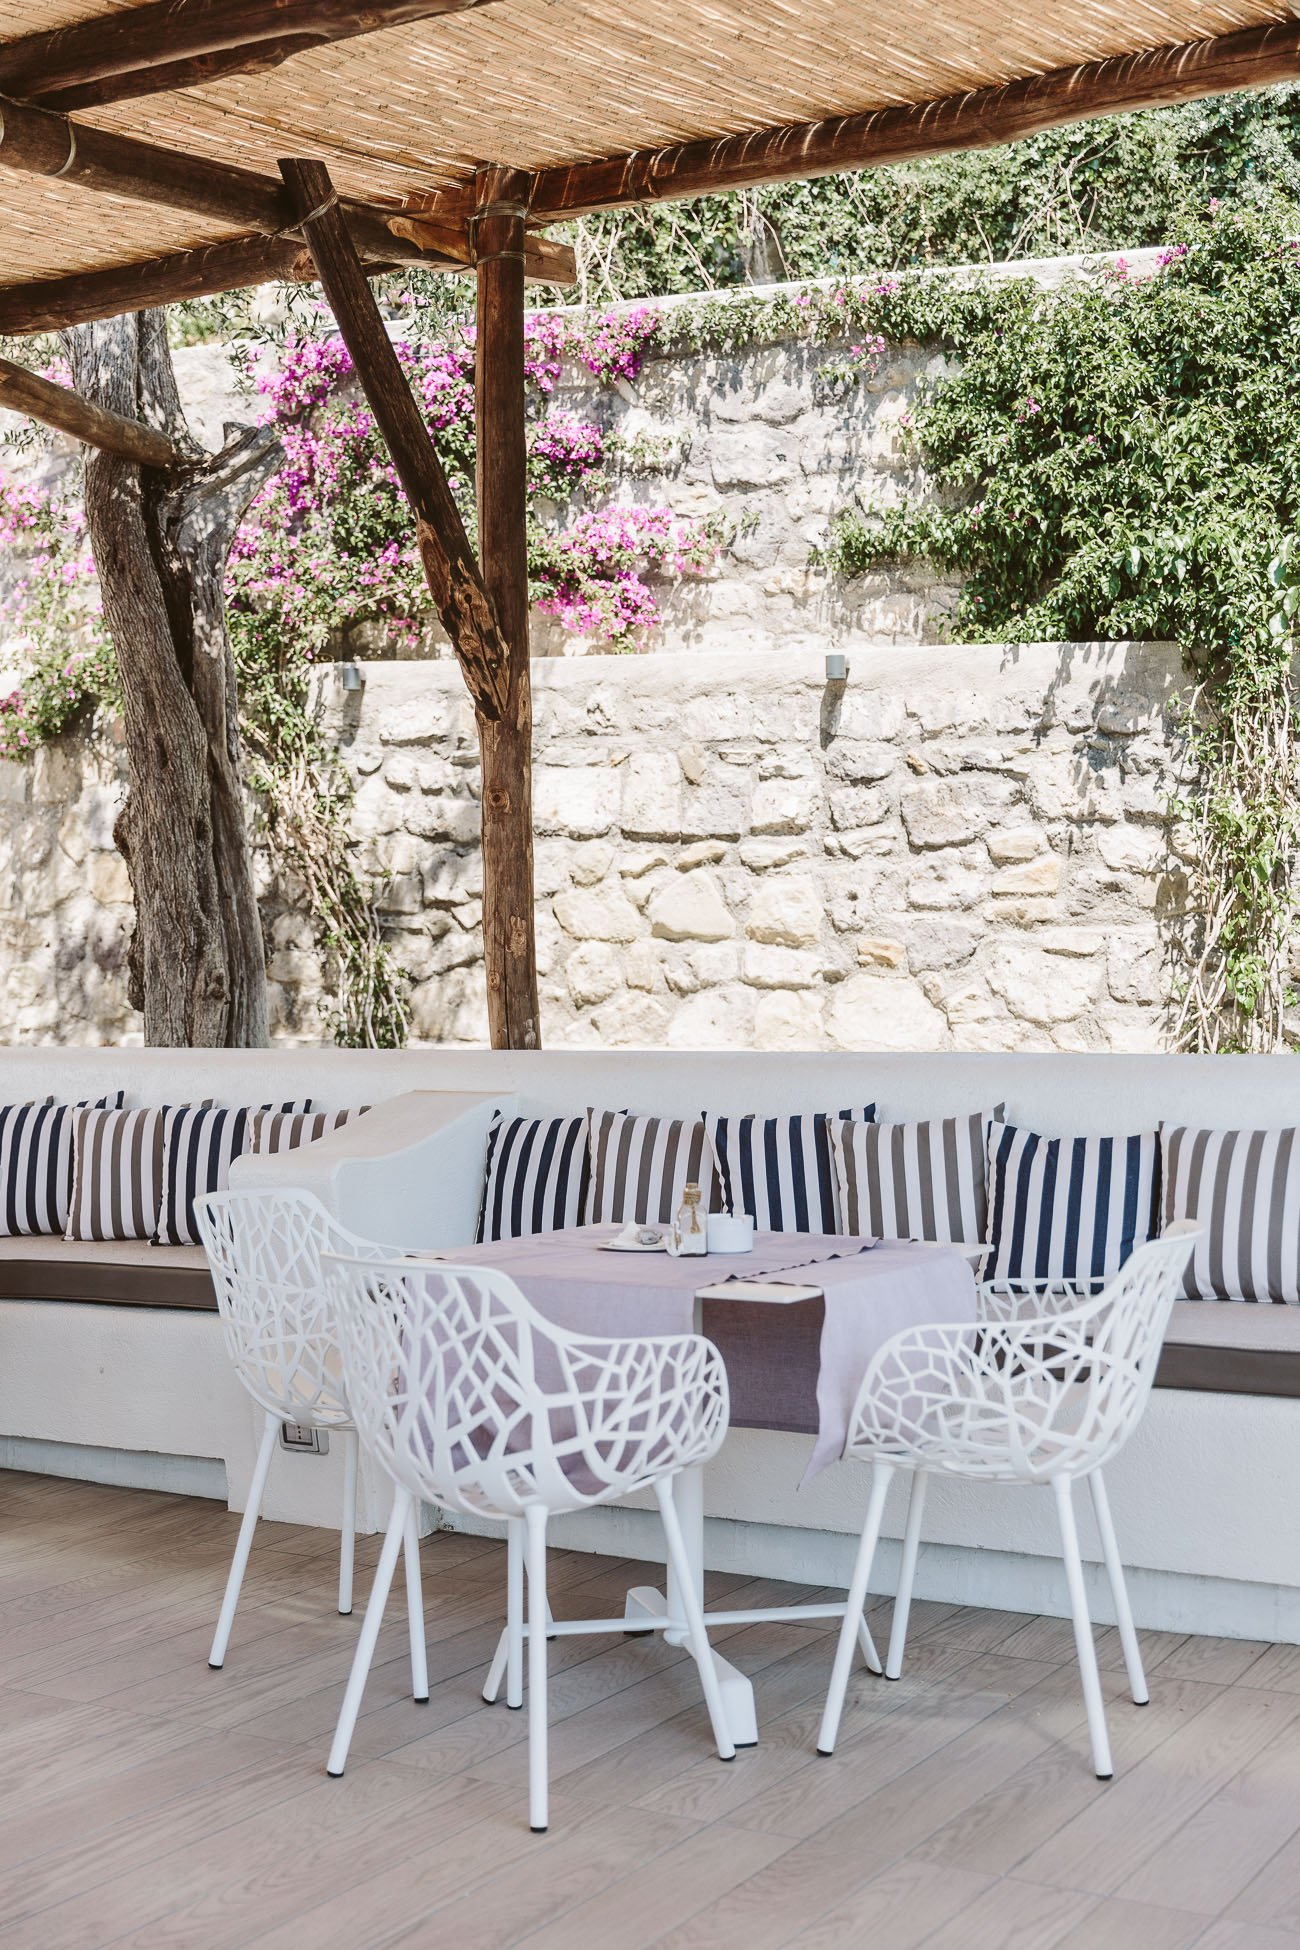 The pool bar at Art Hotel Villa Fiorella